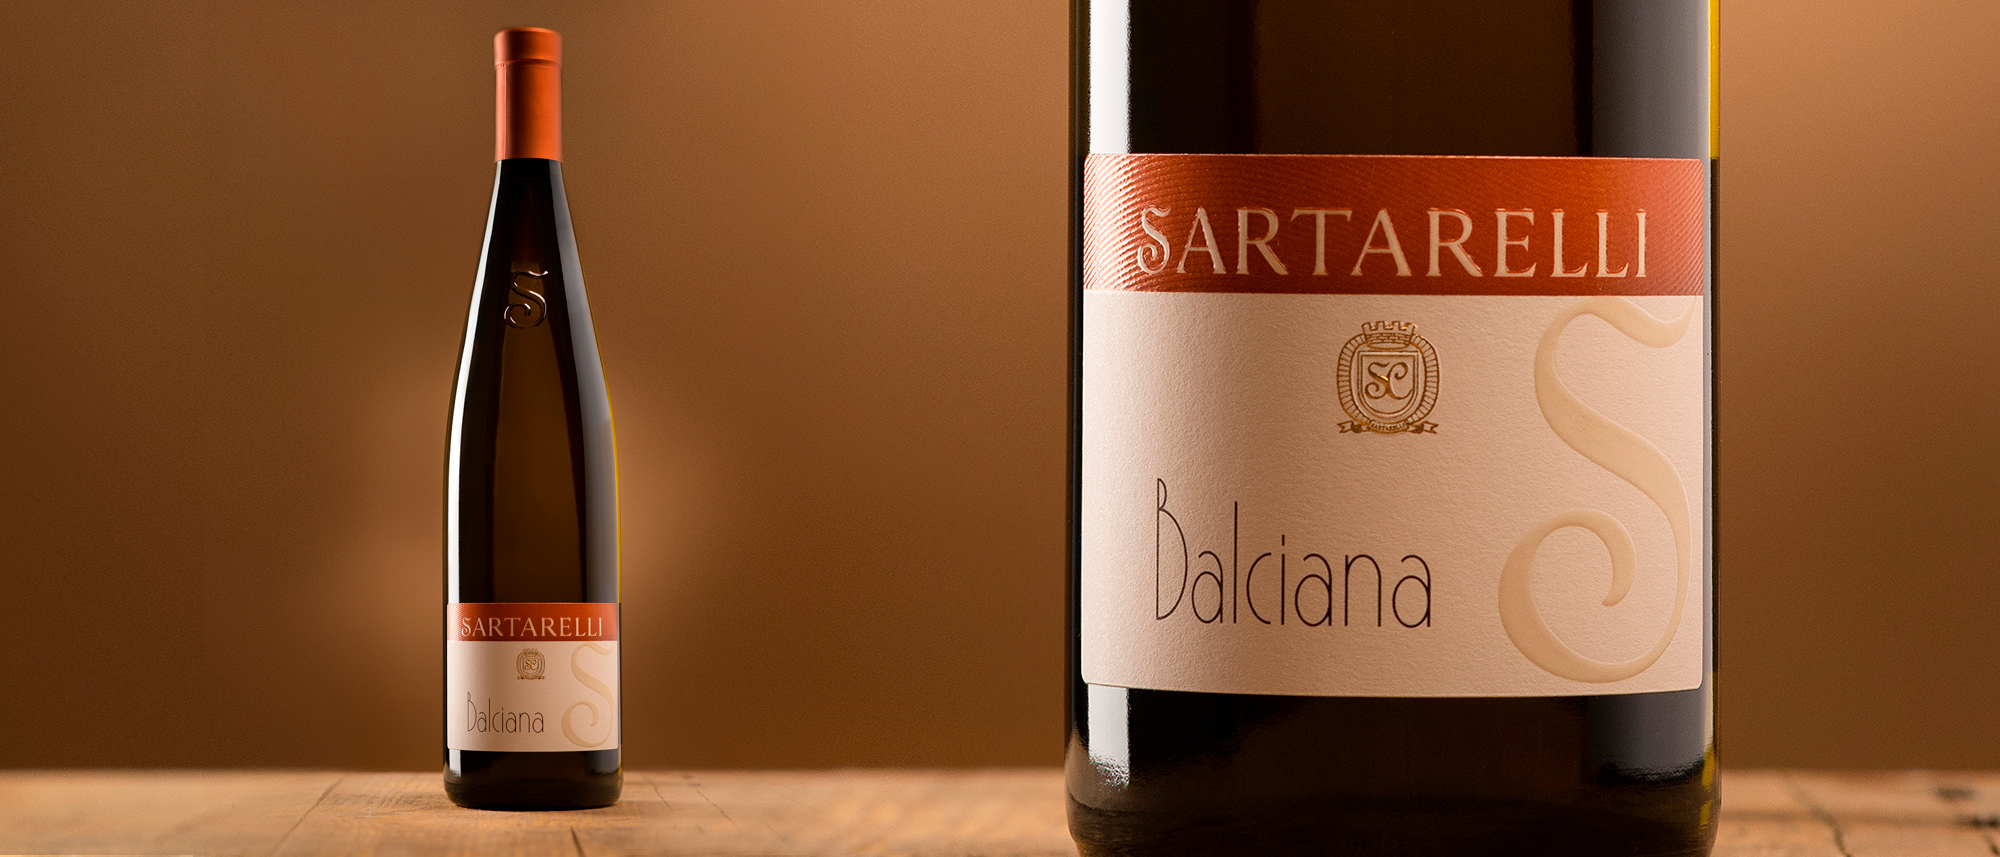 Bottiglia Balciana Sartarelli